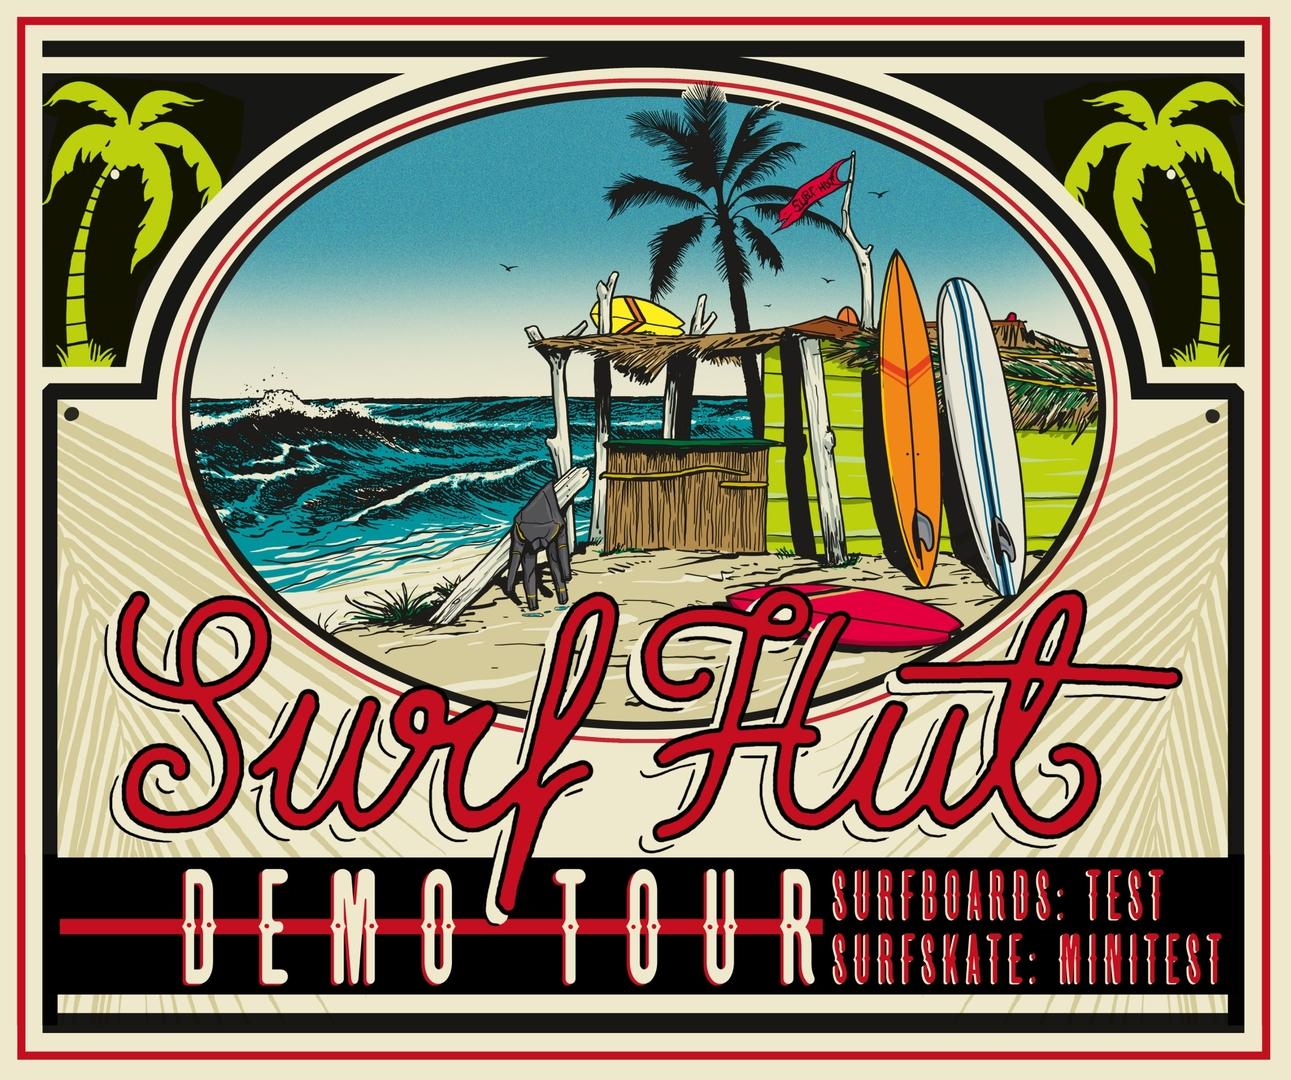 Surf hut demo tour sabato prima tappa a tirrenia 4actionsport - Bagno la pace tirrenia ...